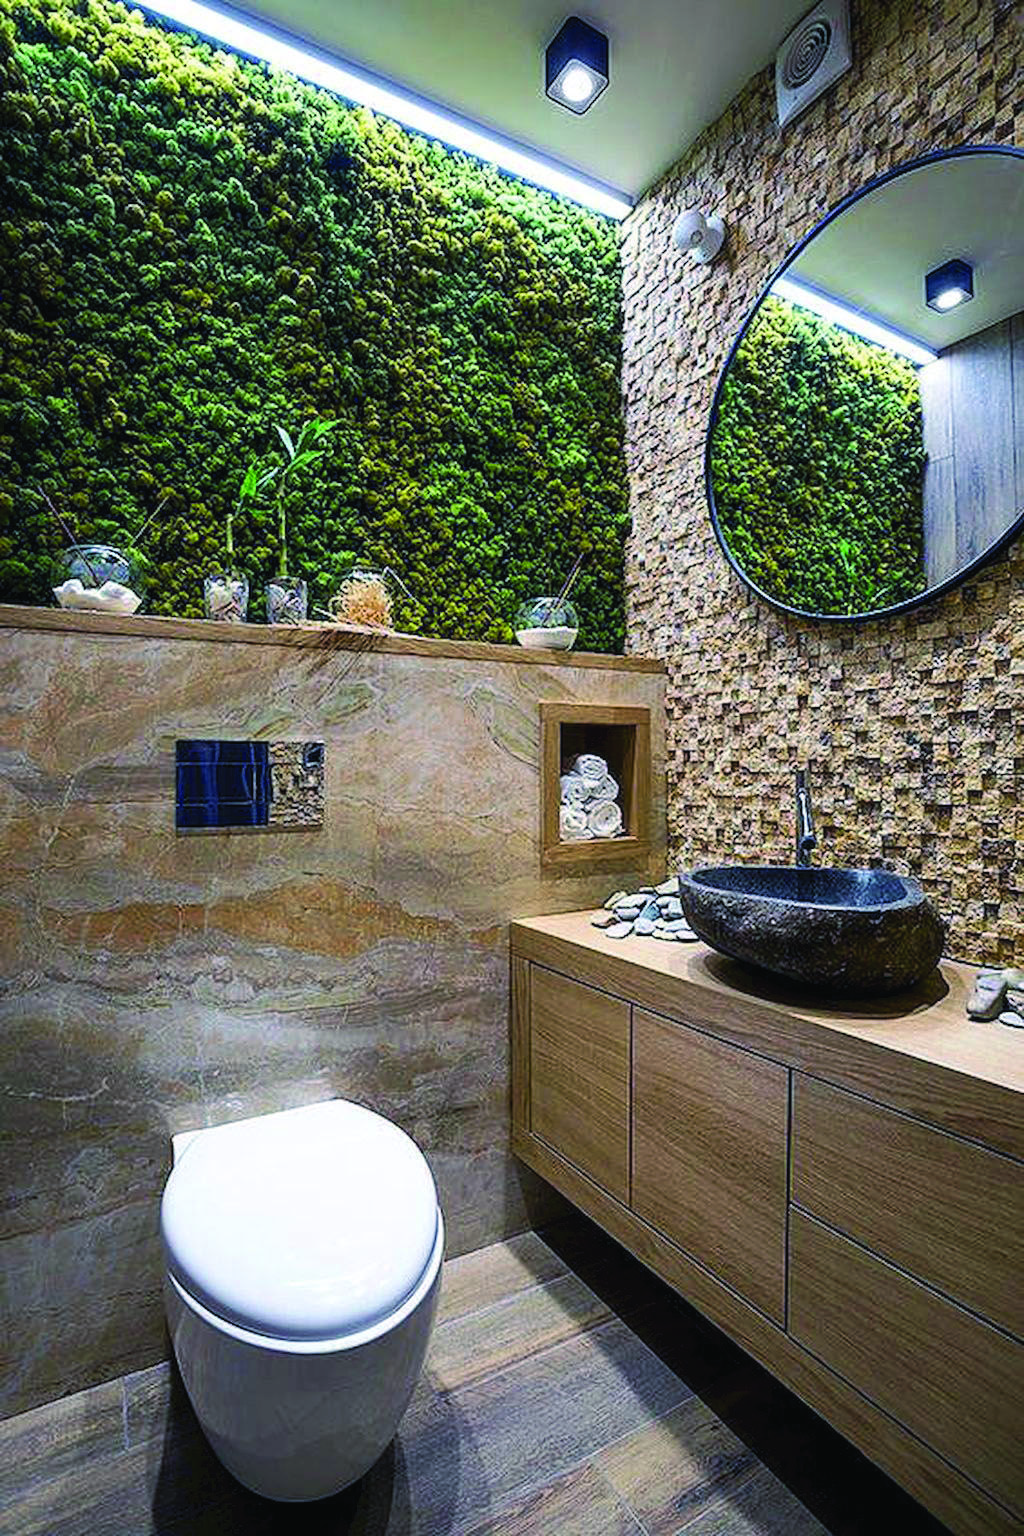 Good interior design ideas 1 room kitchen flat made easy